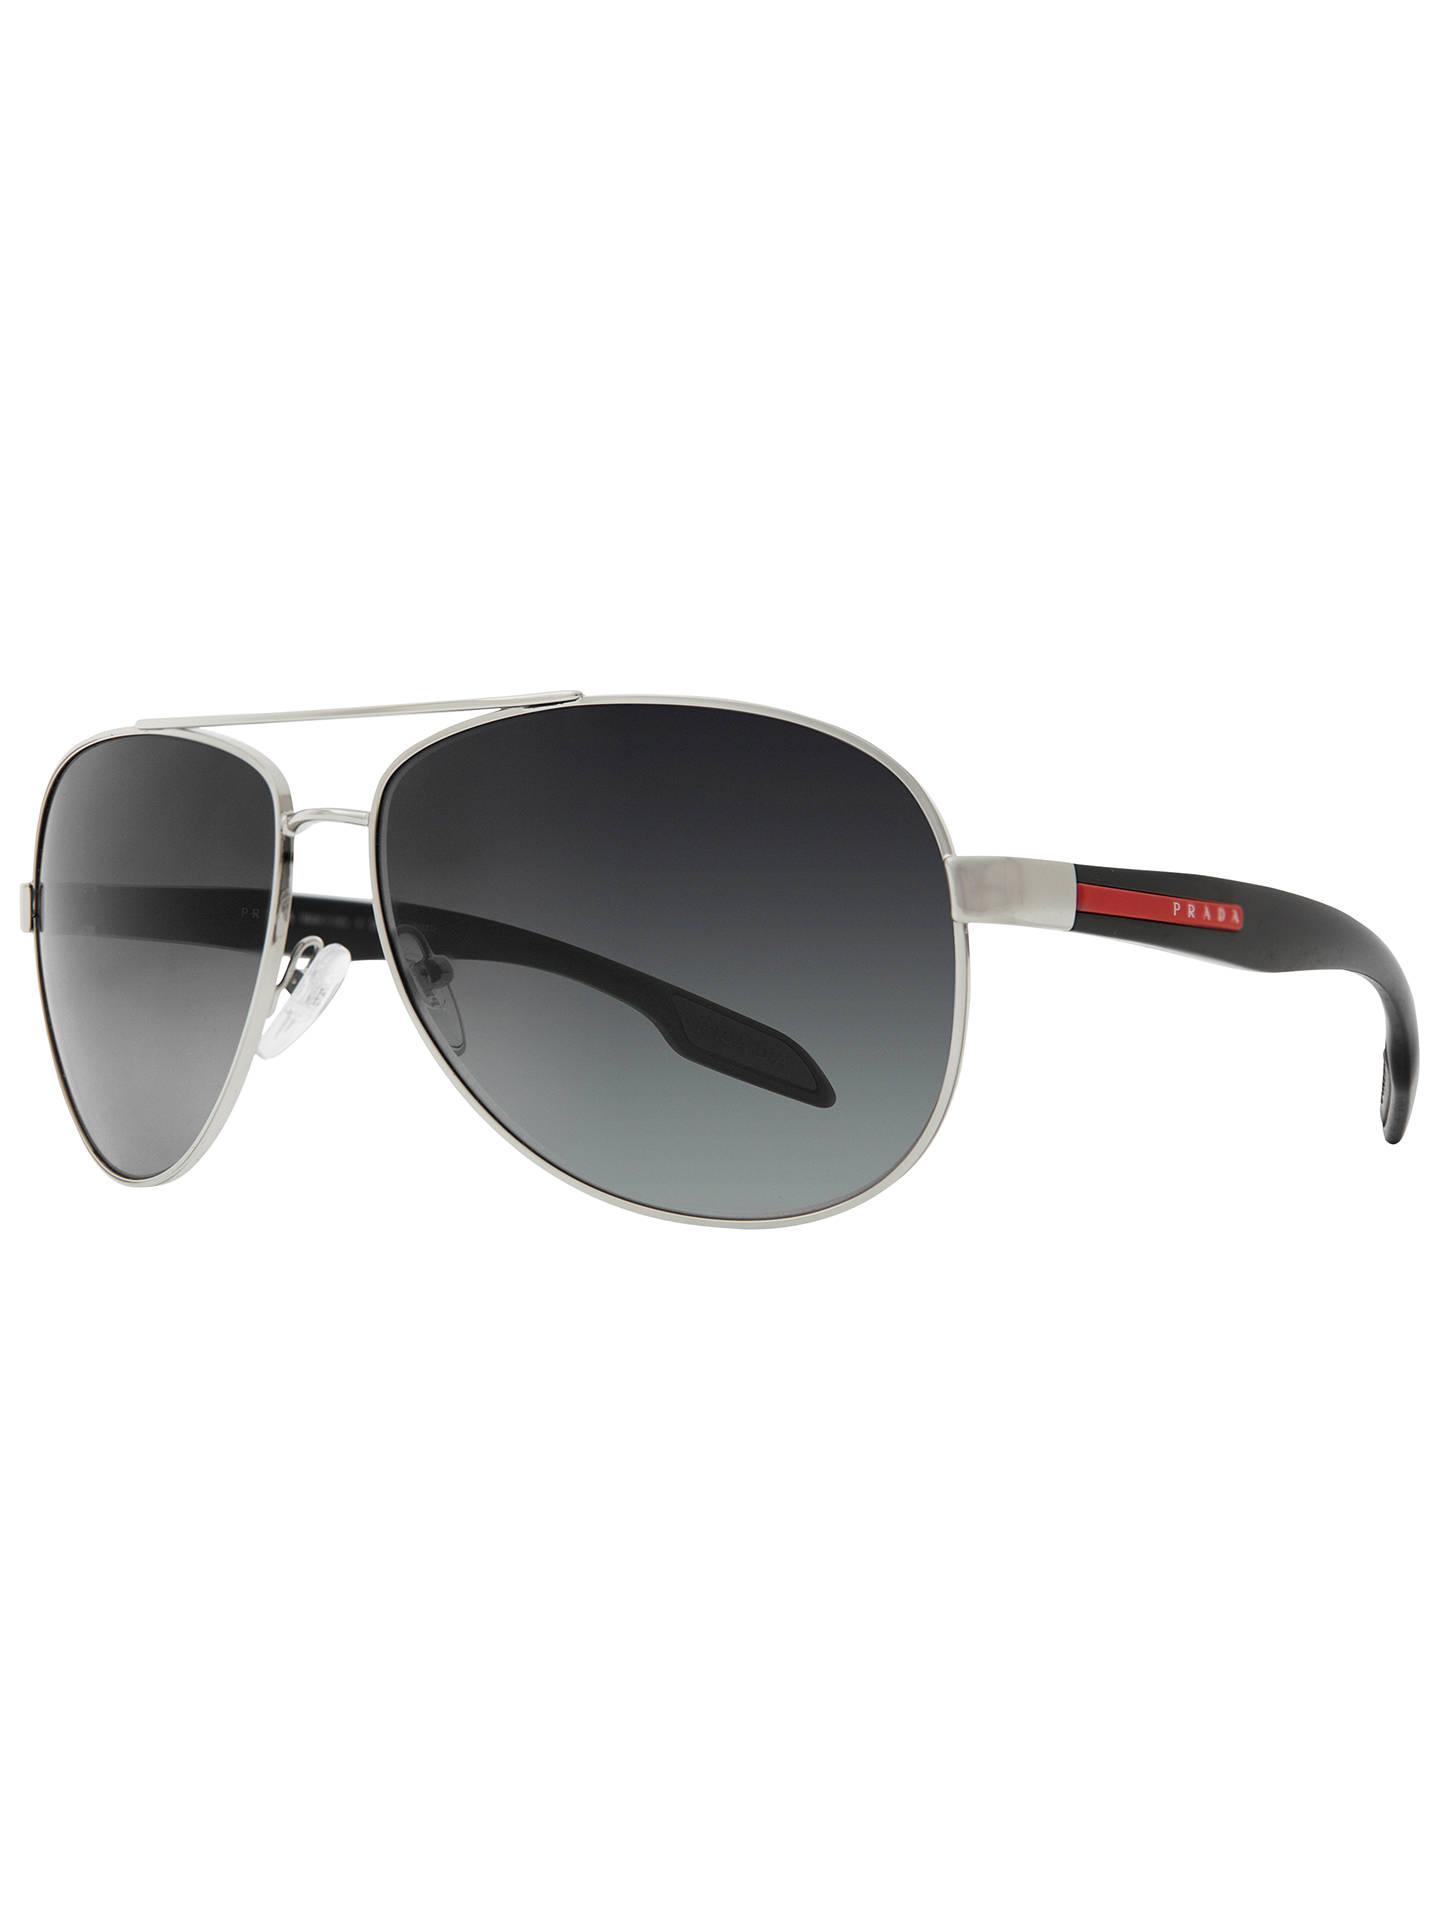 d904c00a207 Buy Prada Linea Rossa PS53PS Polarised Classic Aviator Metal Frame  Sunglasses